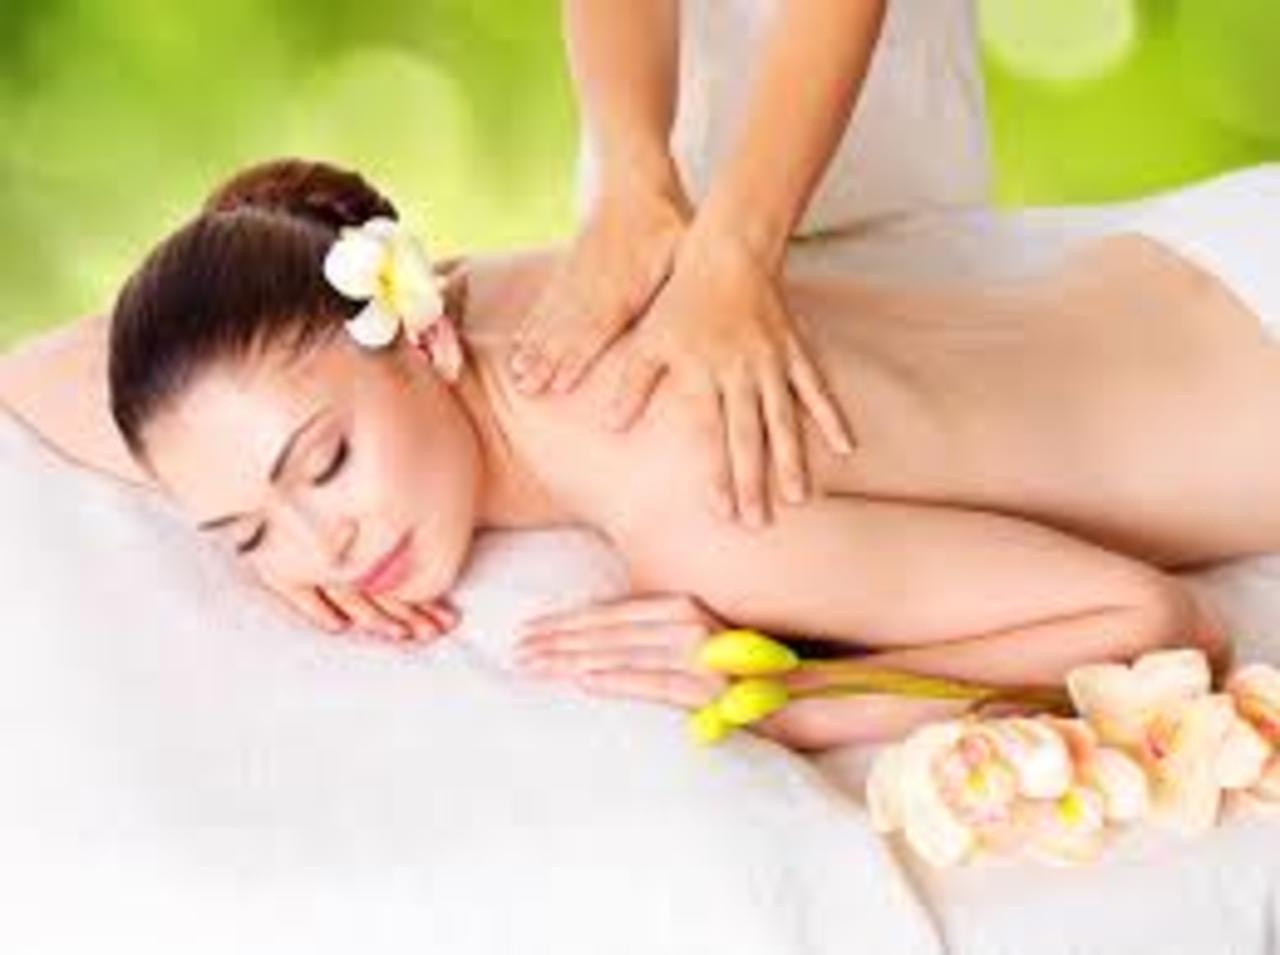 Undraped massage experience